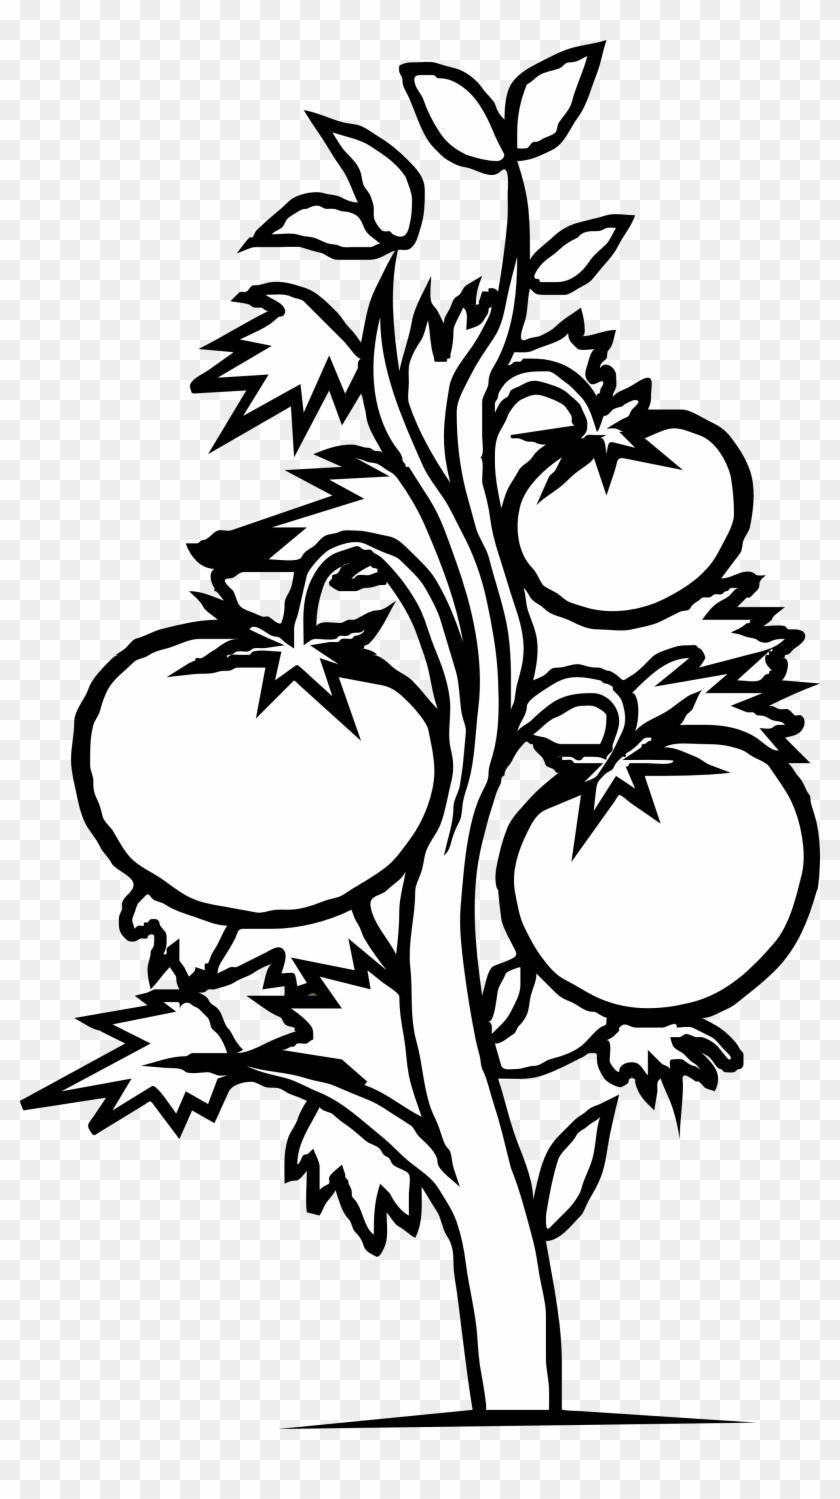 Plant Clip Art Black And White.